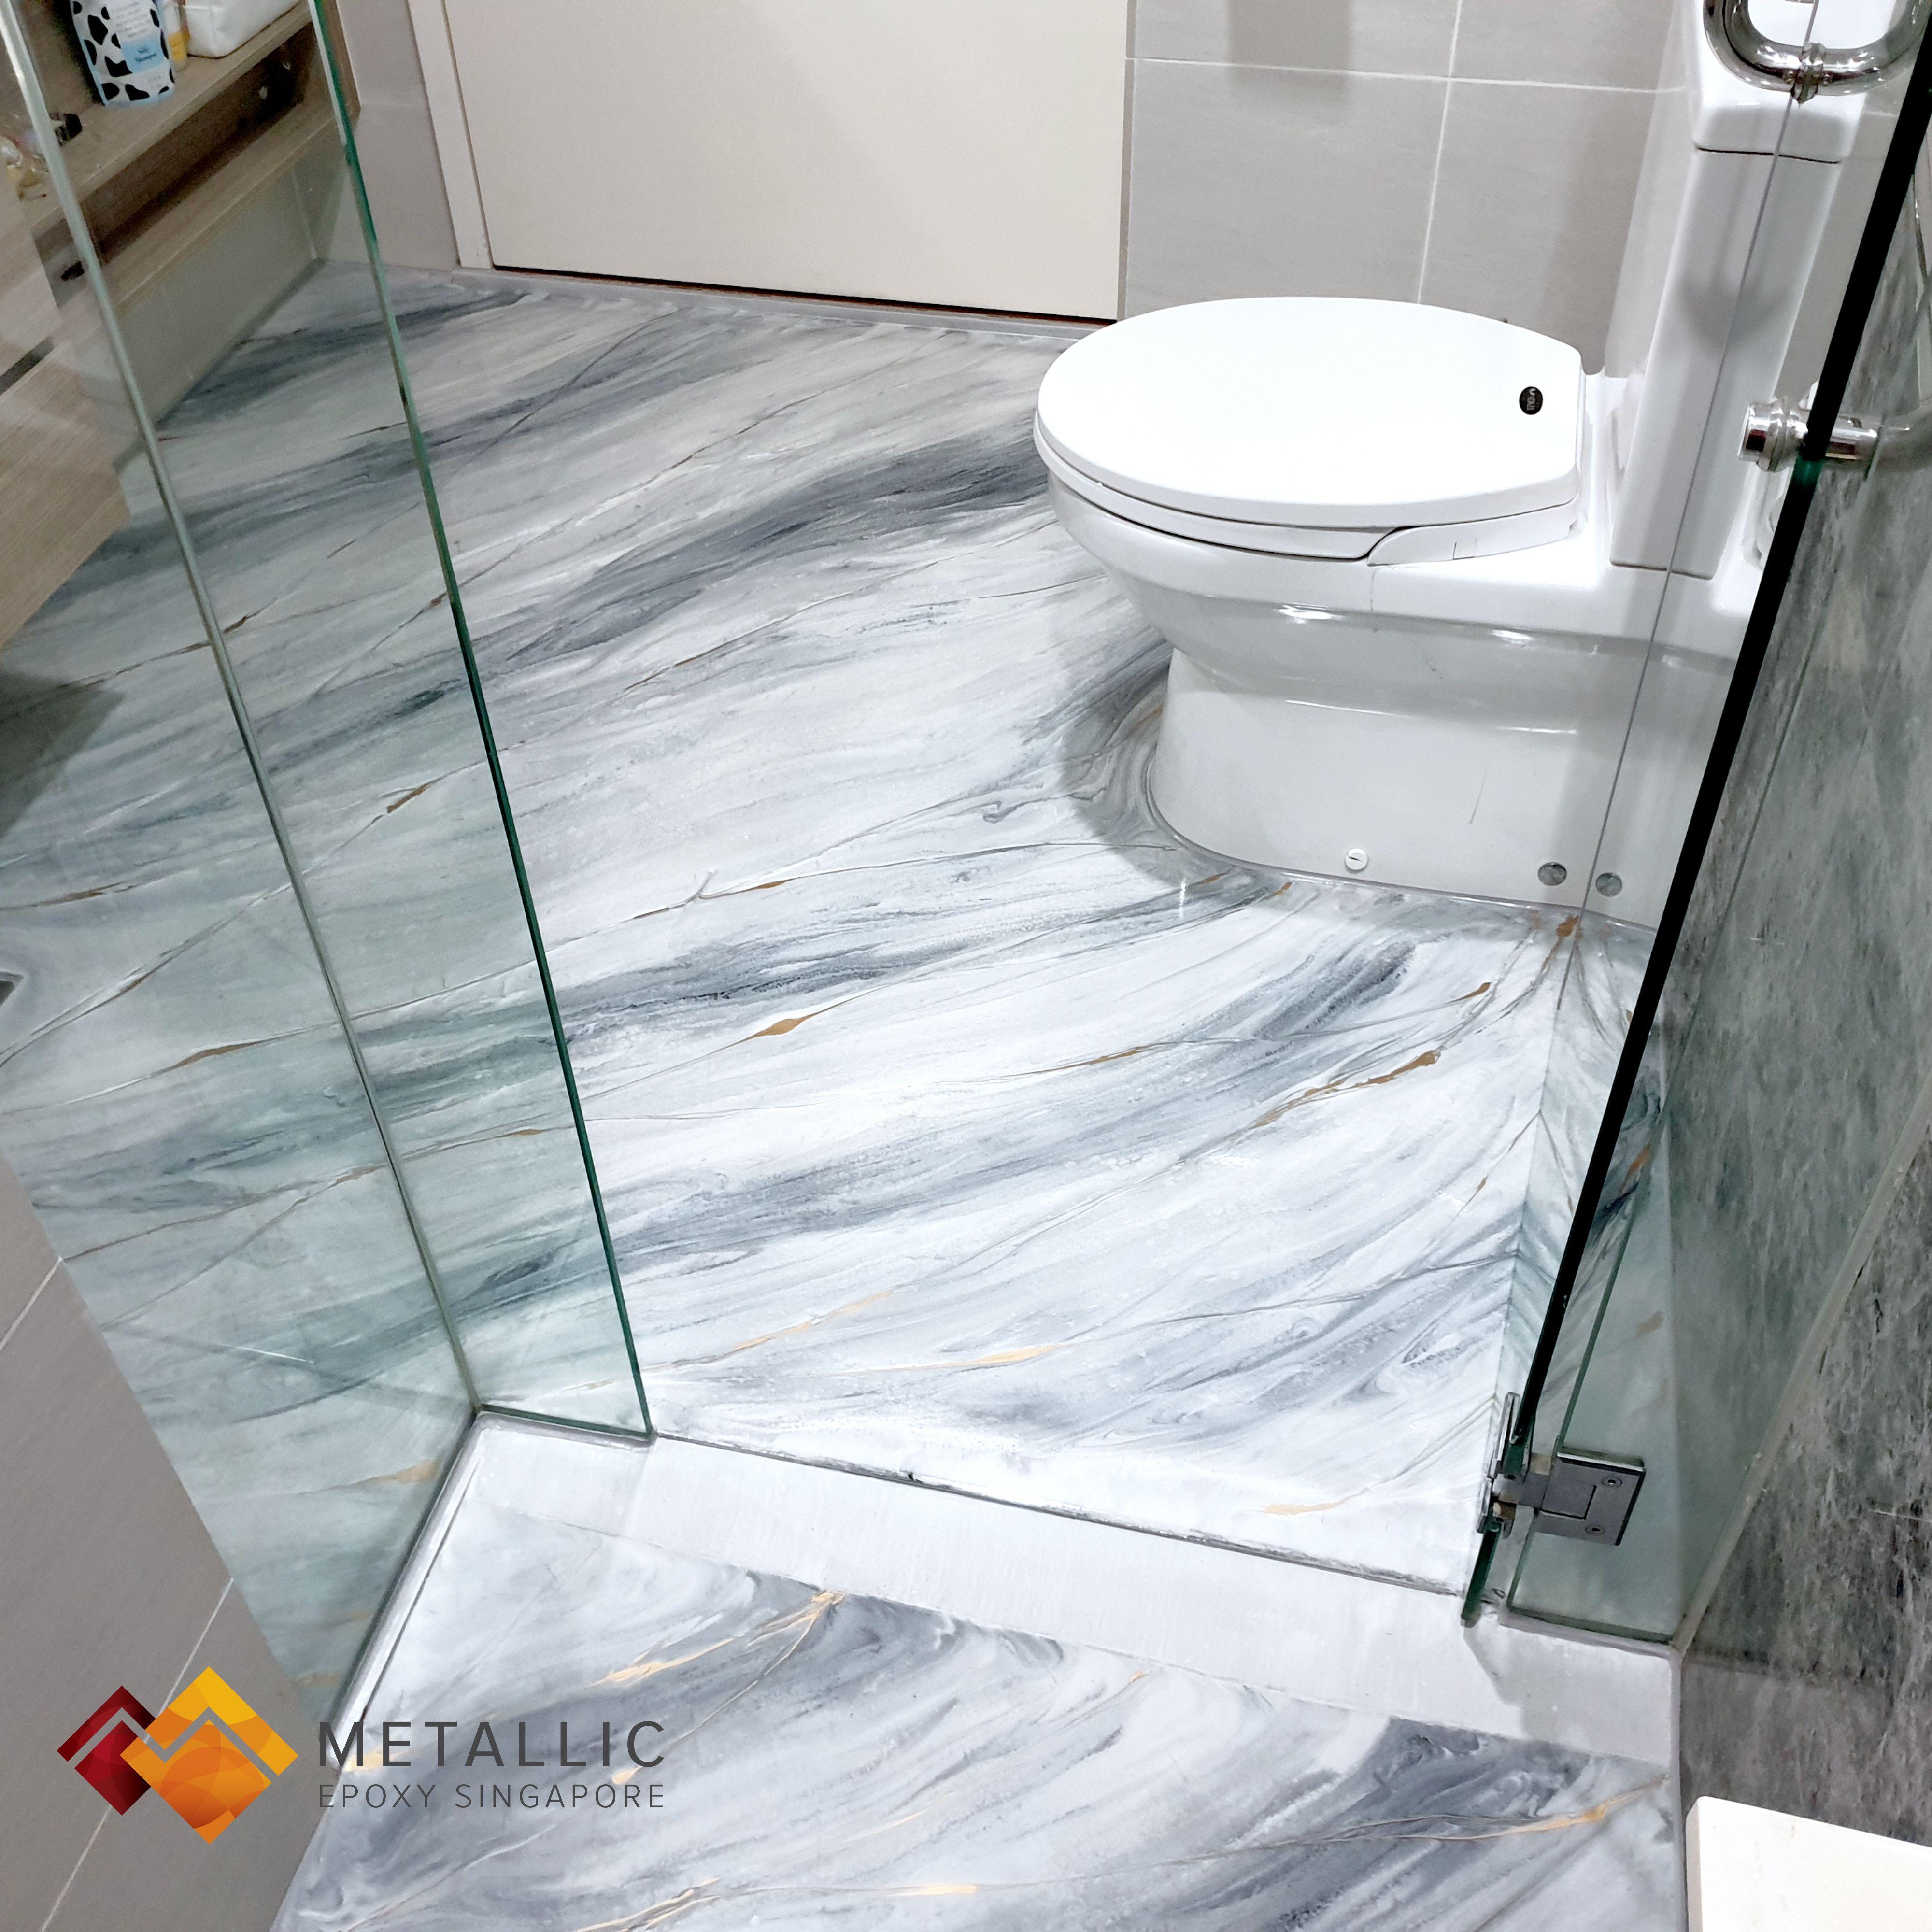 Metallic Epoxy Silver Gold Highlights On Light Grey Marble Bathroom Floor In 2020 Badkamer Vloer Epoxy Vintage